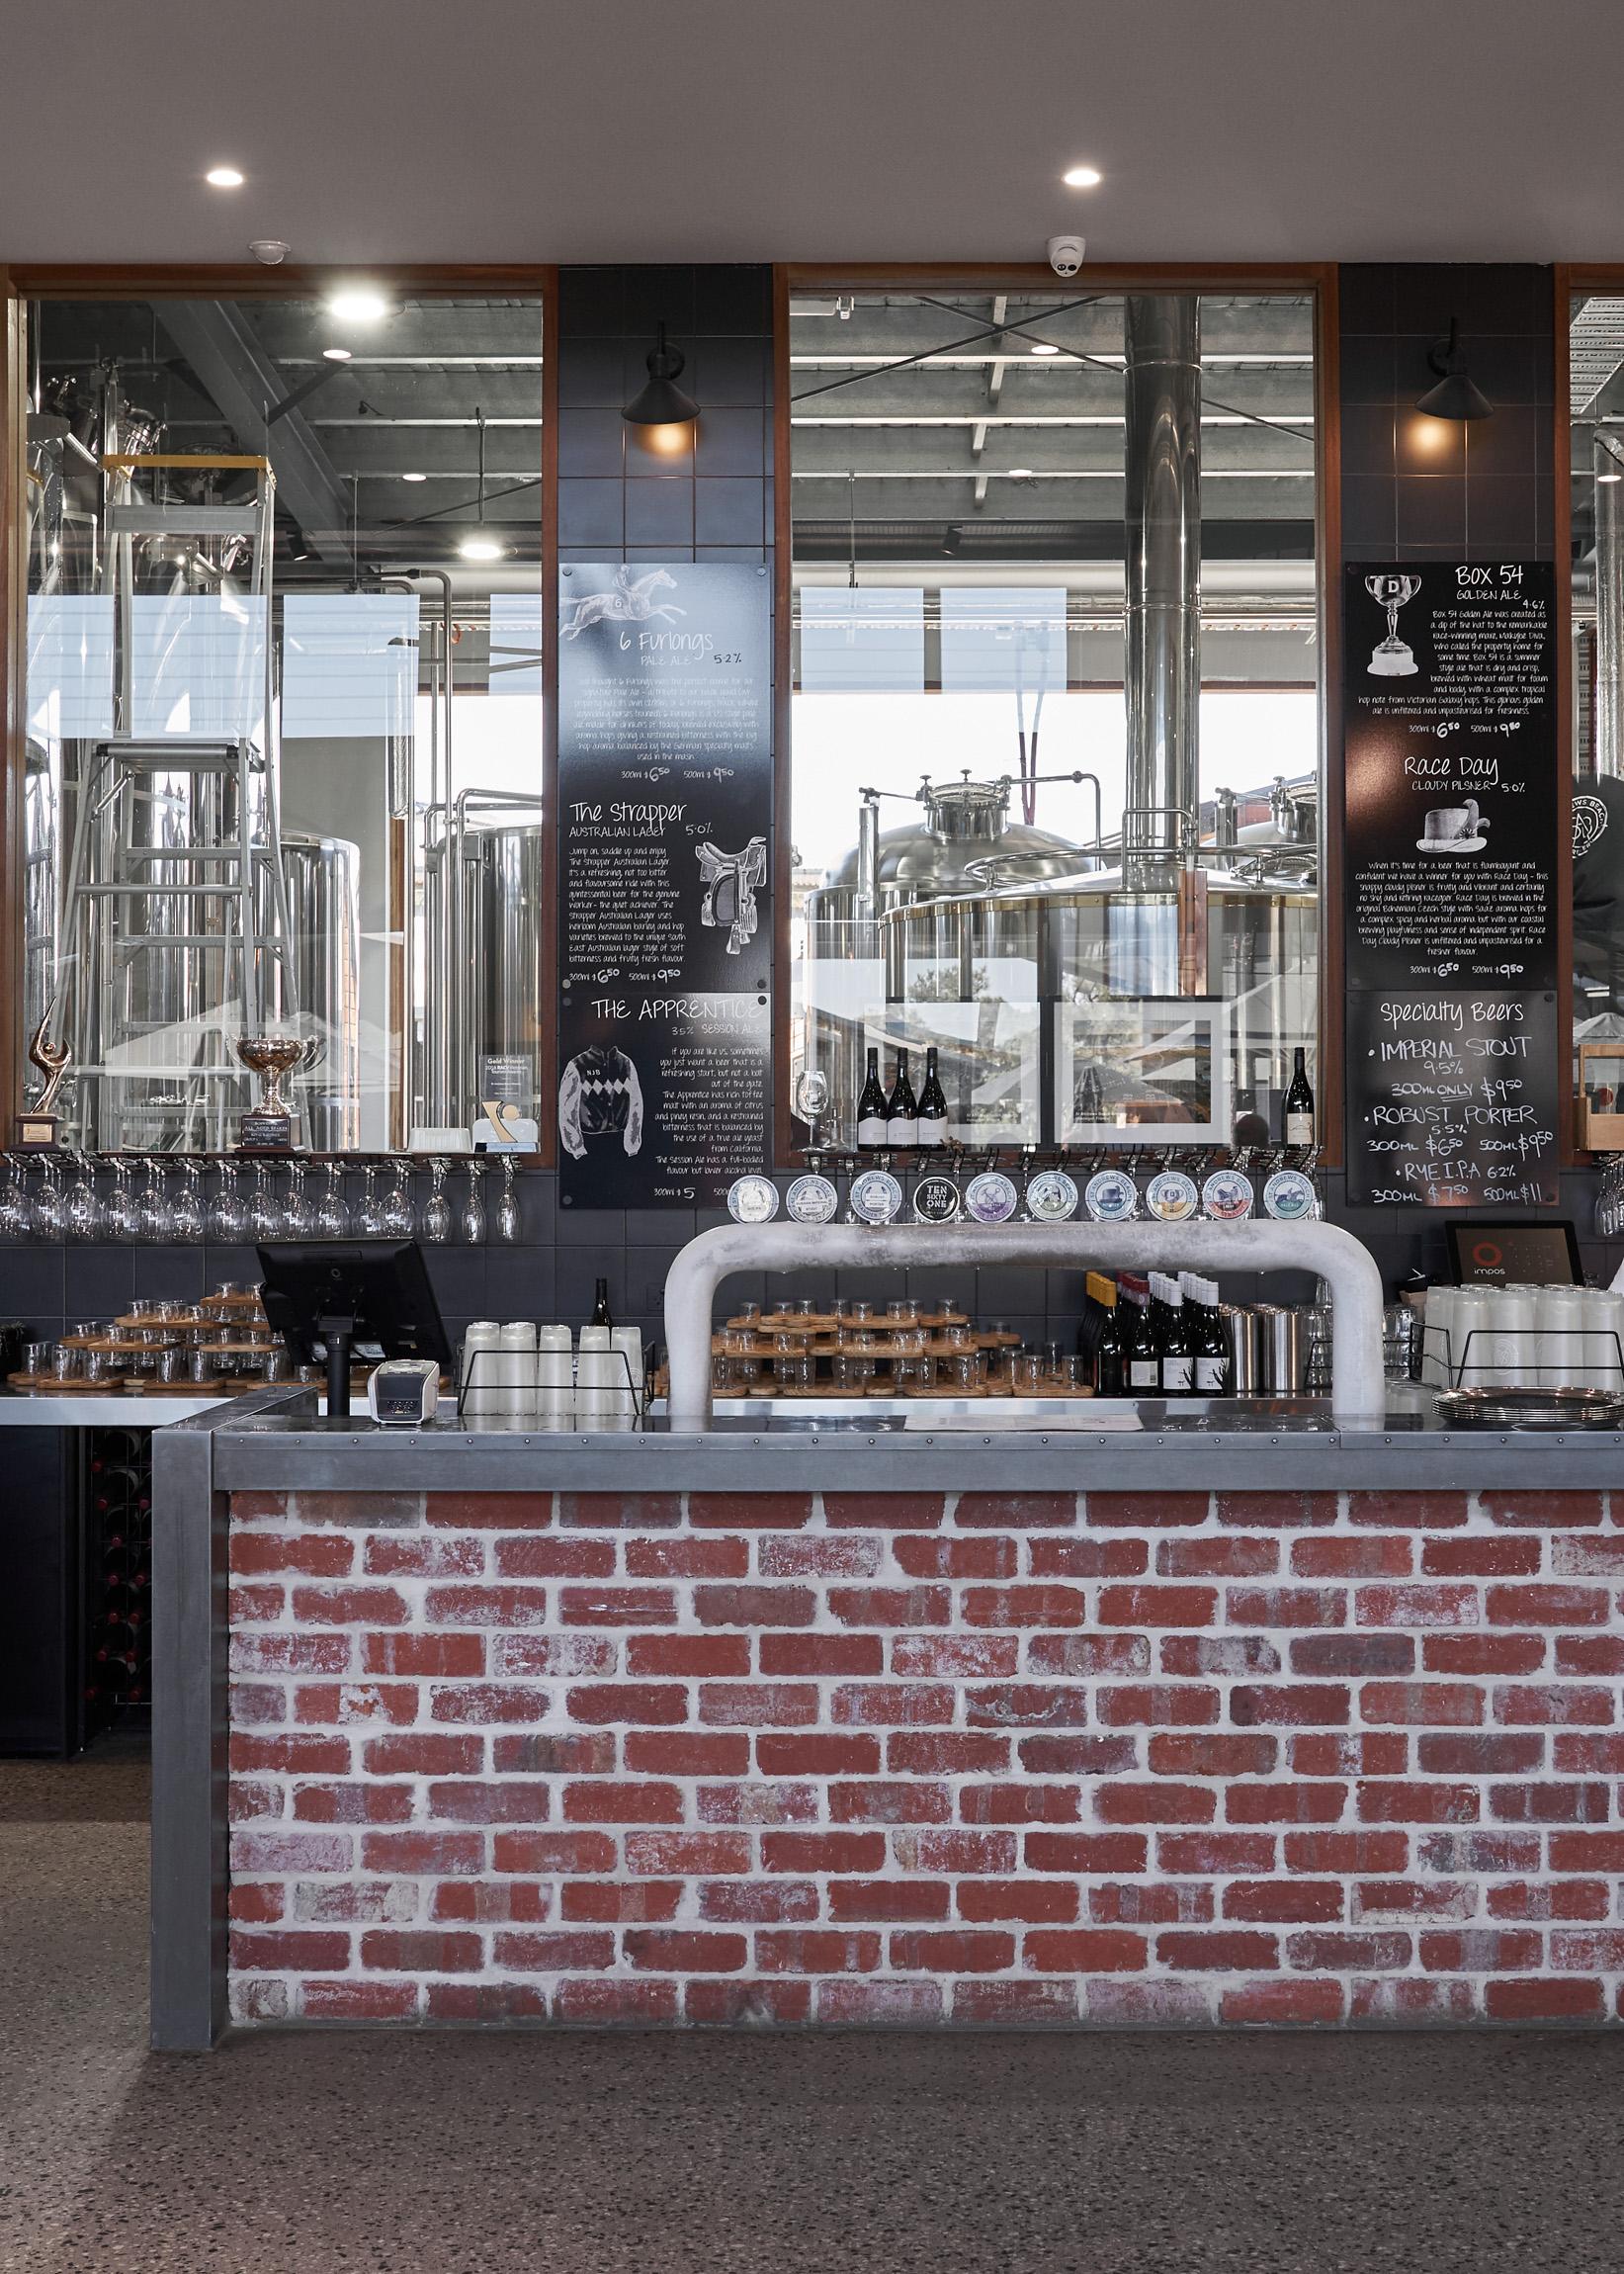 St Andrews Beach Brewery Mornington Peninsula